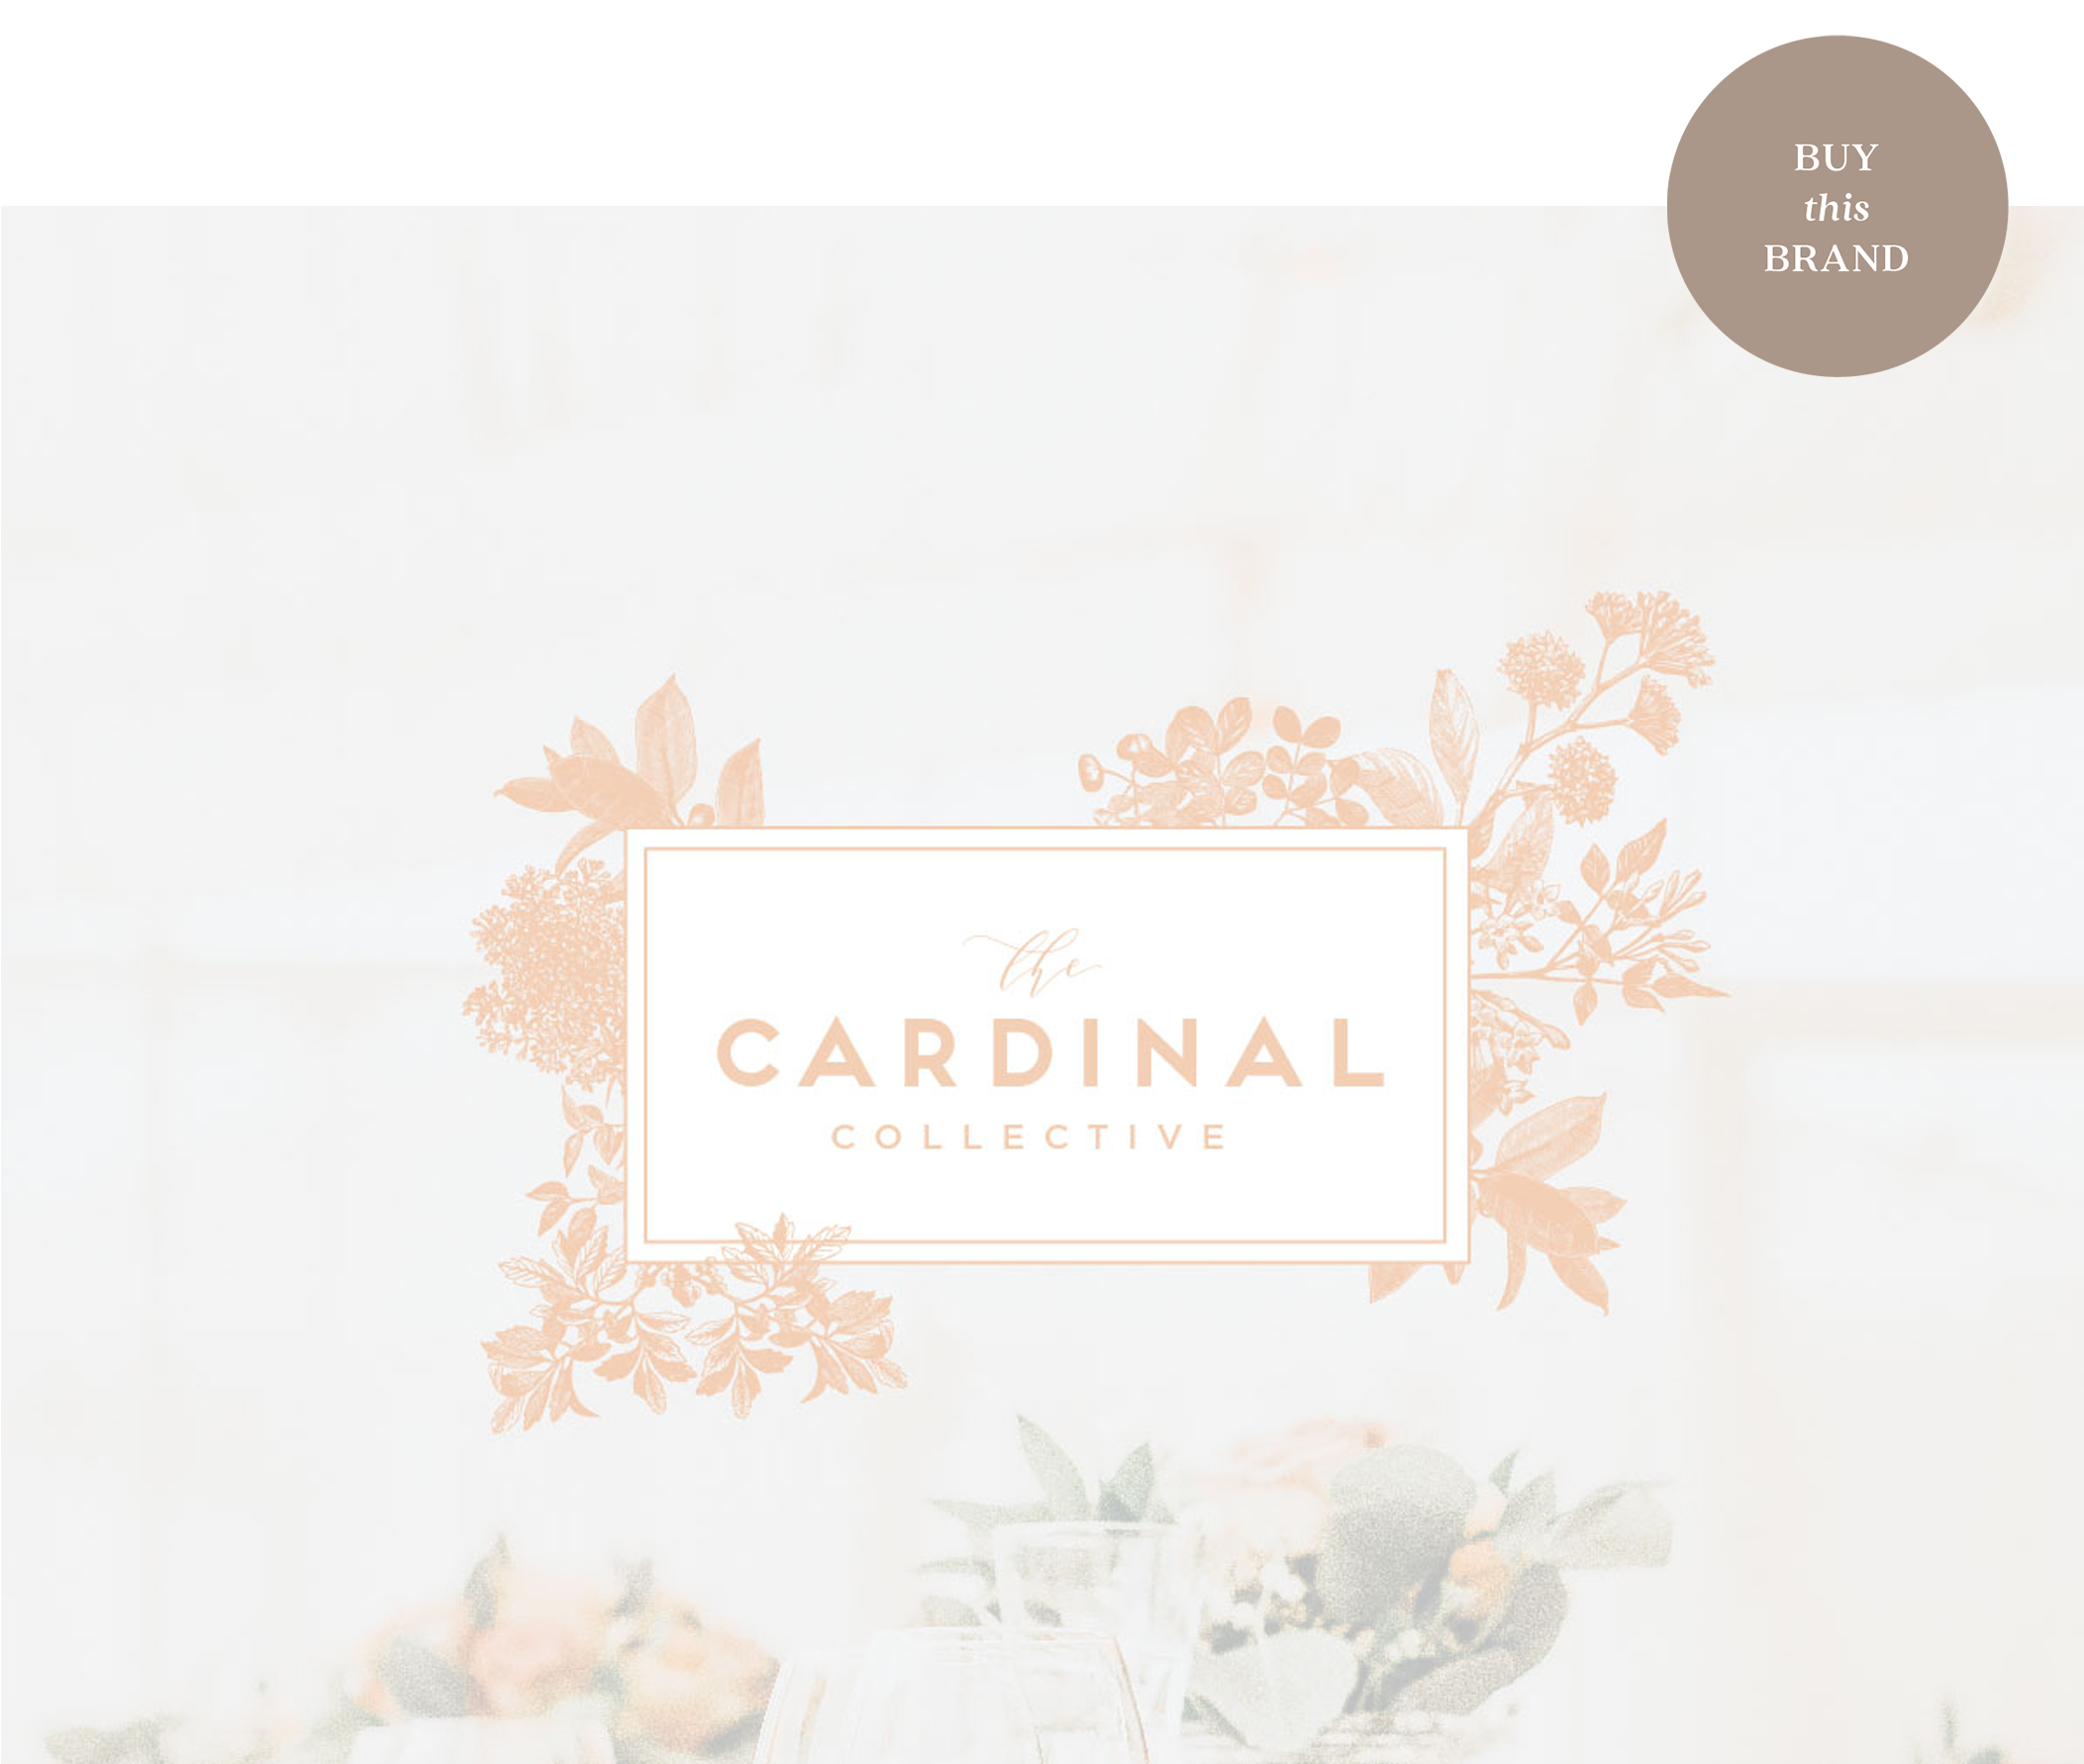 Cardinal-Collective Brand-01.jpg